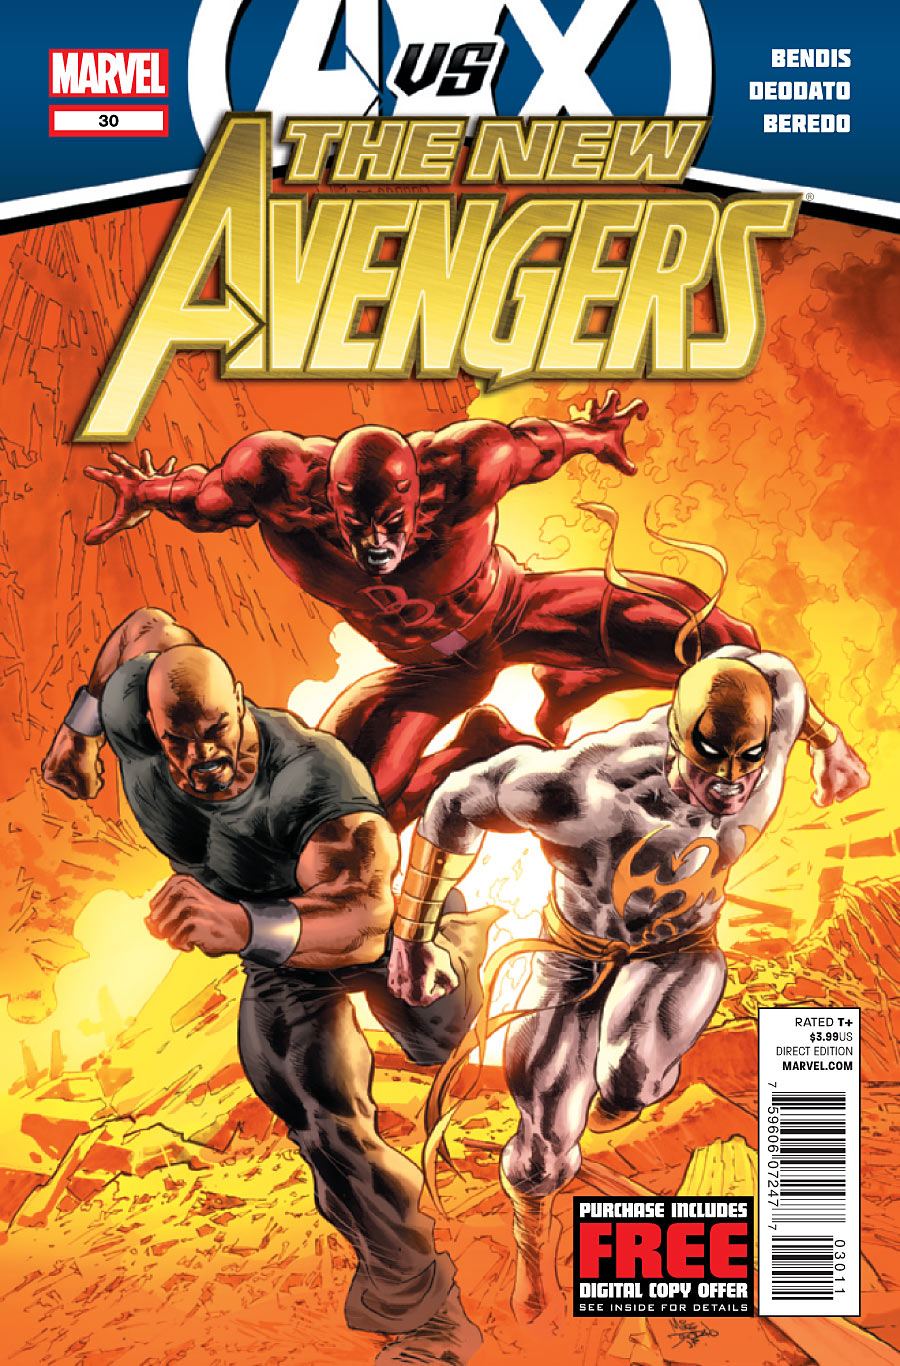 The New Avengers #30